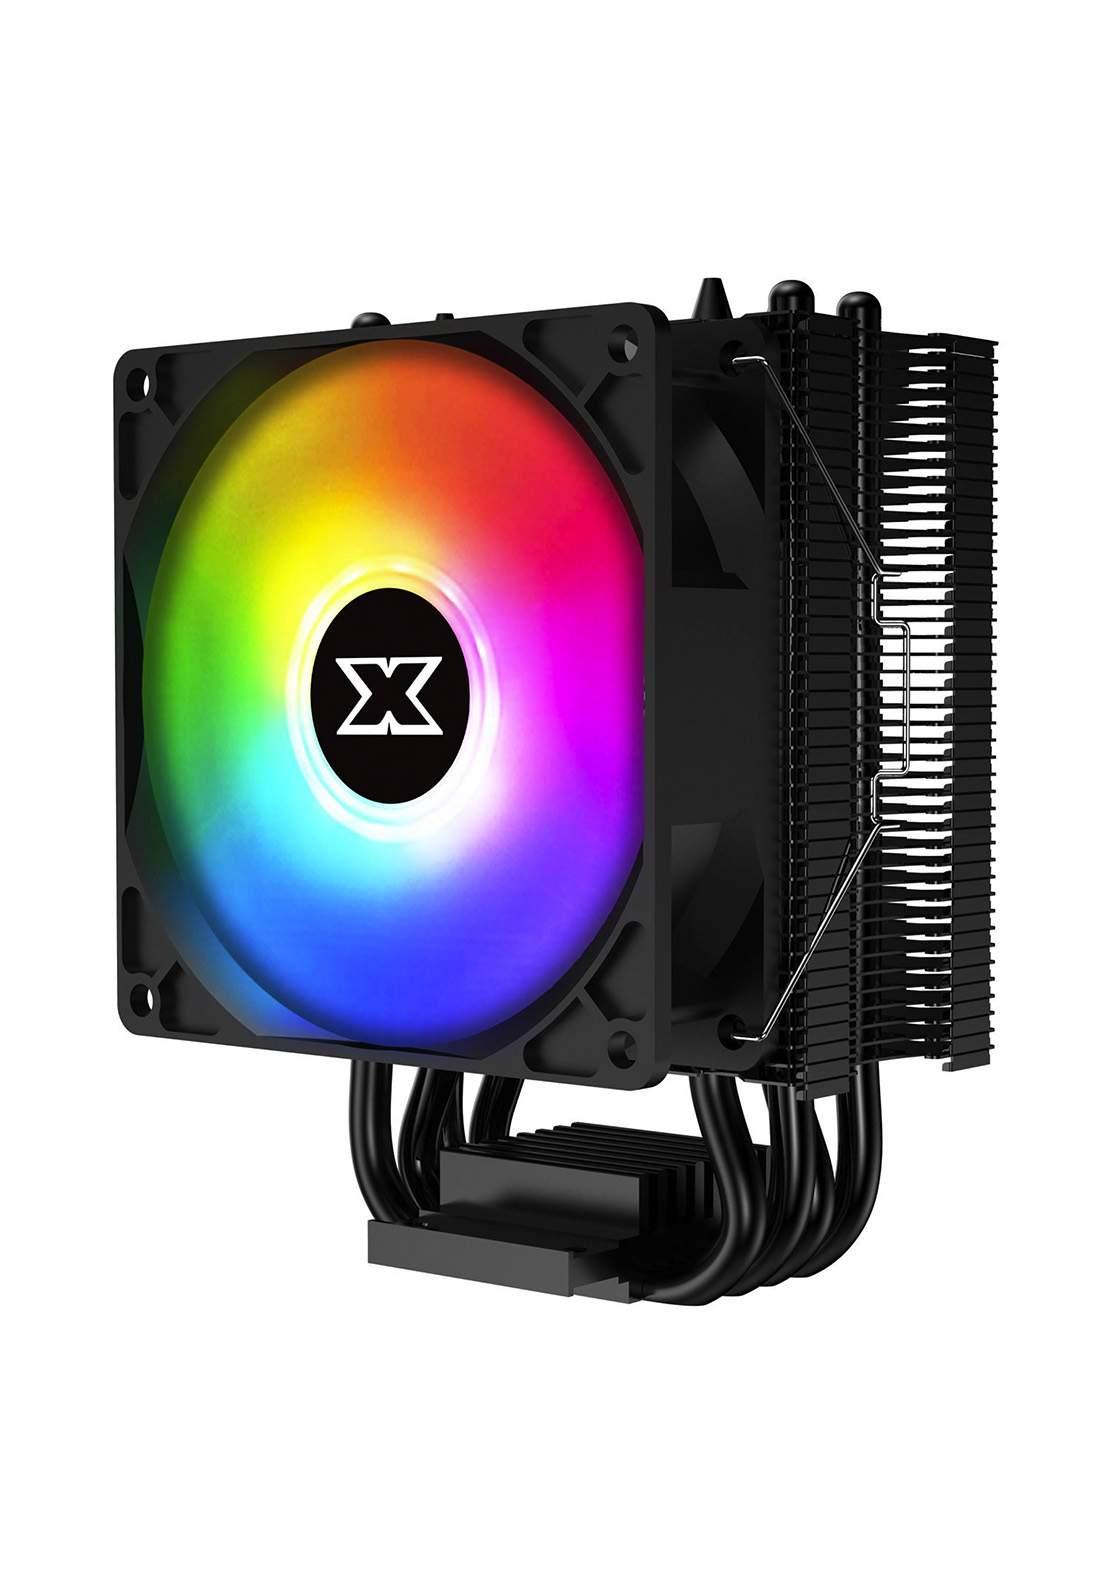 Xigmatek Windpower Wp964 RGB  90mm CPU Air Cooler مبرد معالج